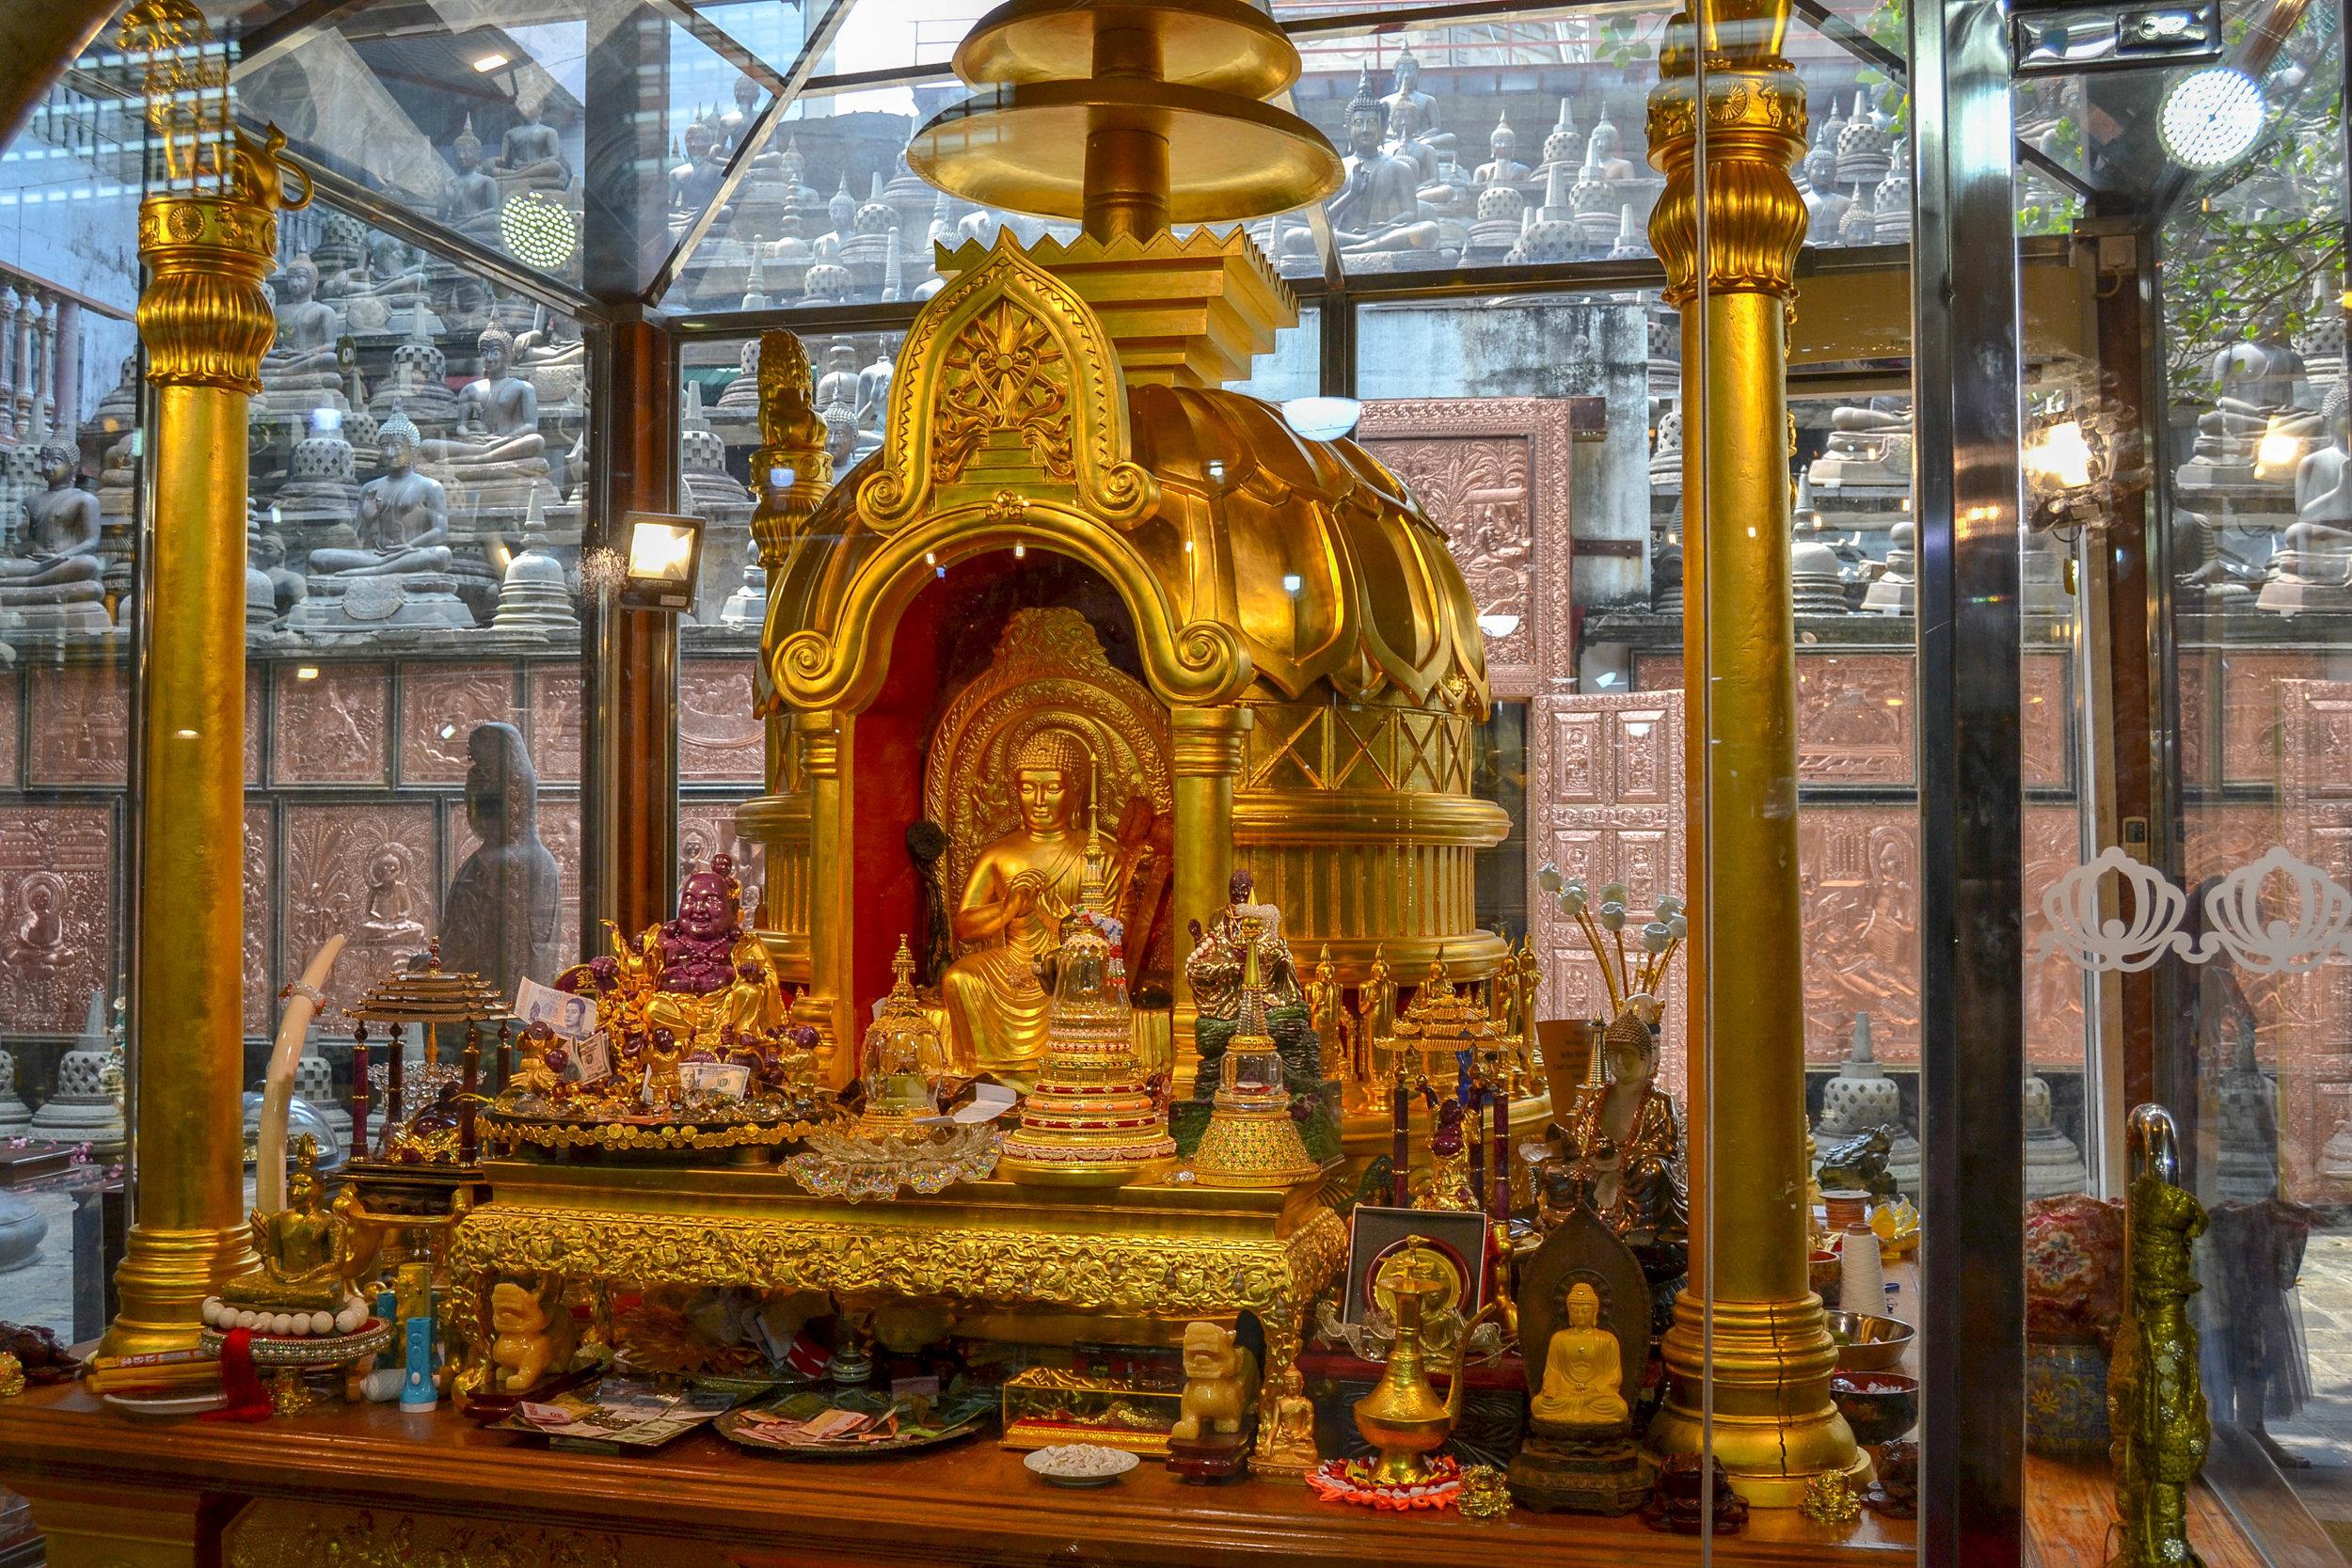 Gangaramaya Relic Museum